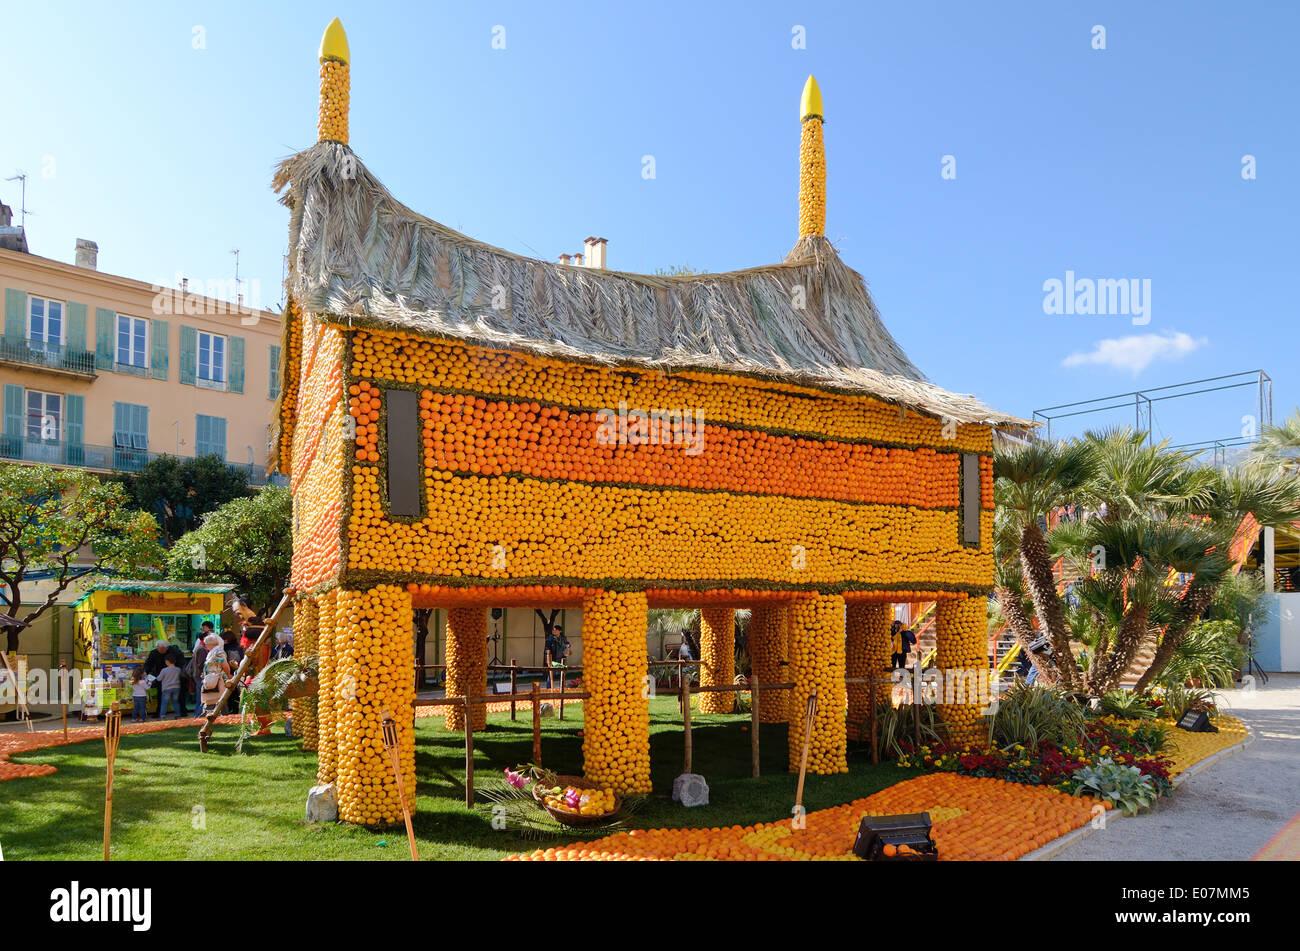 Fantasy House from Papua New Guinea Built of Oranges at the Annual Lemon Festival Menton Alpes-Maritimes France - Stock Image